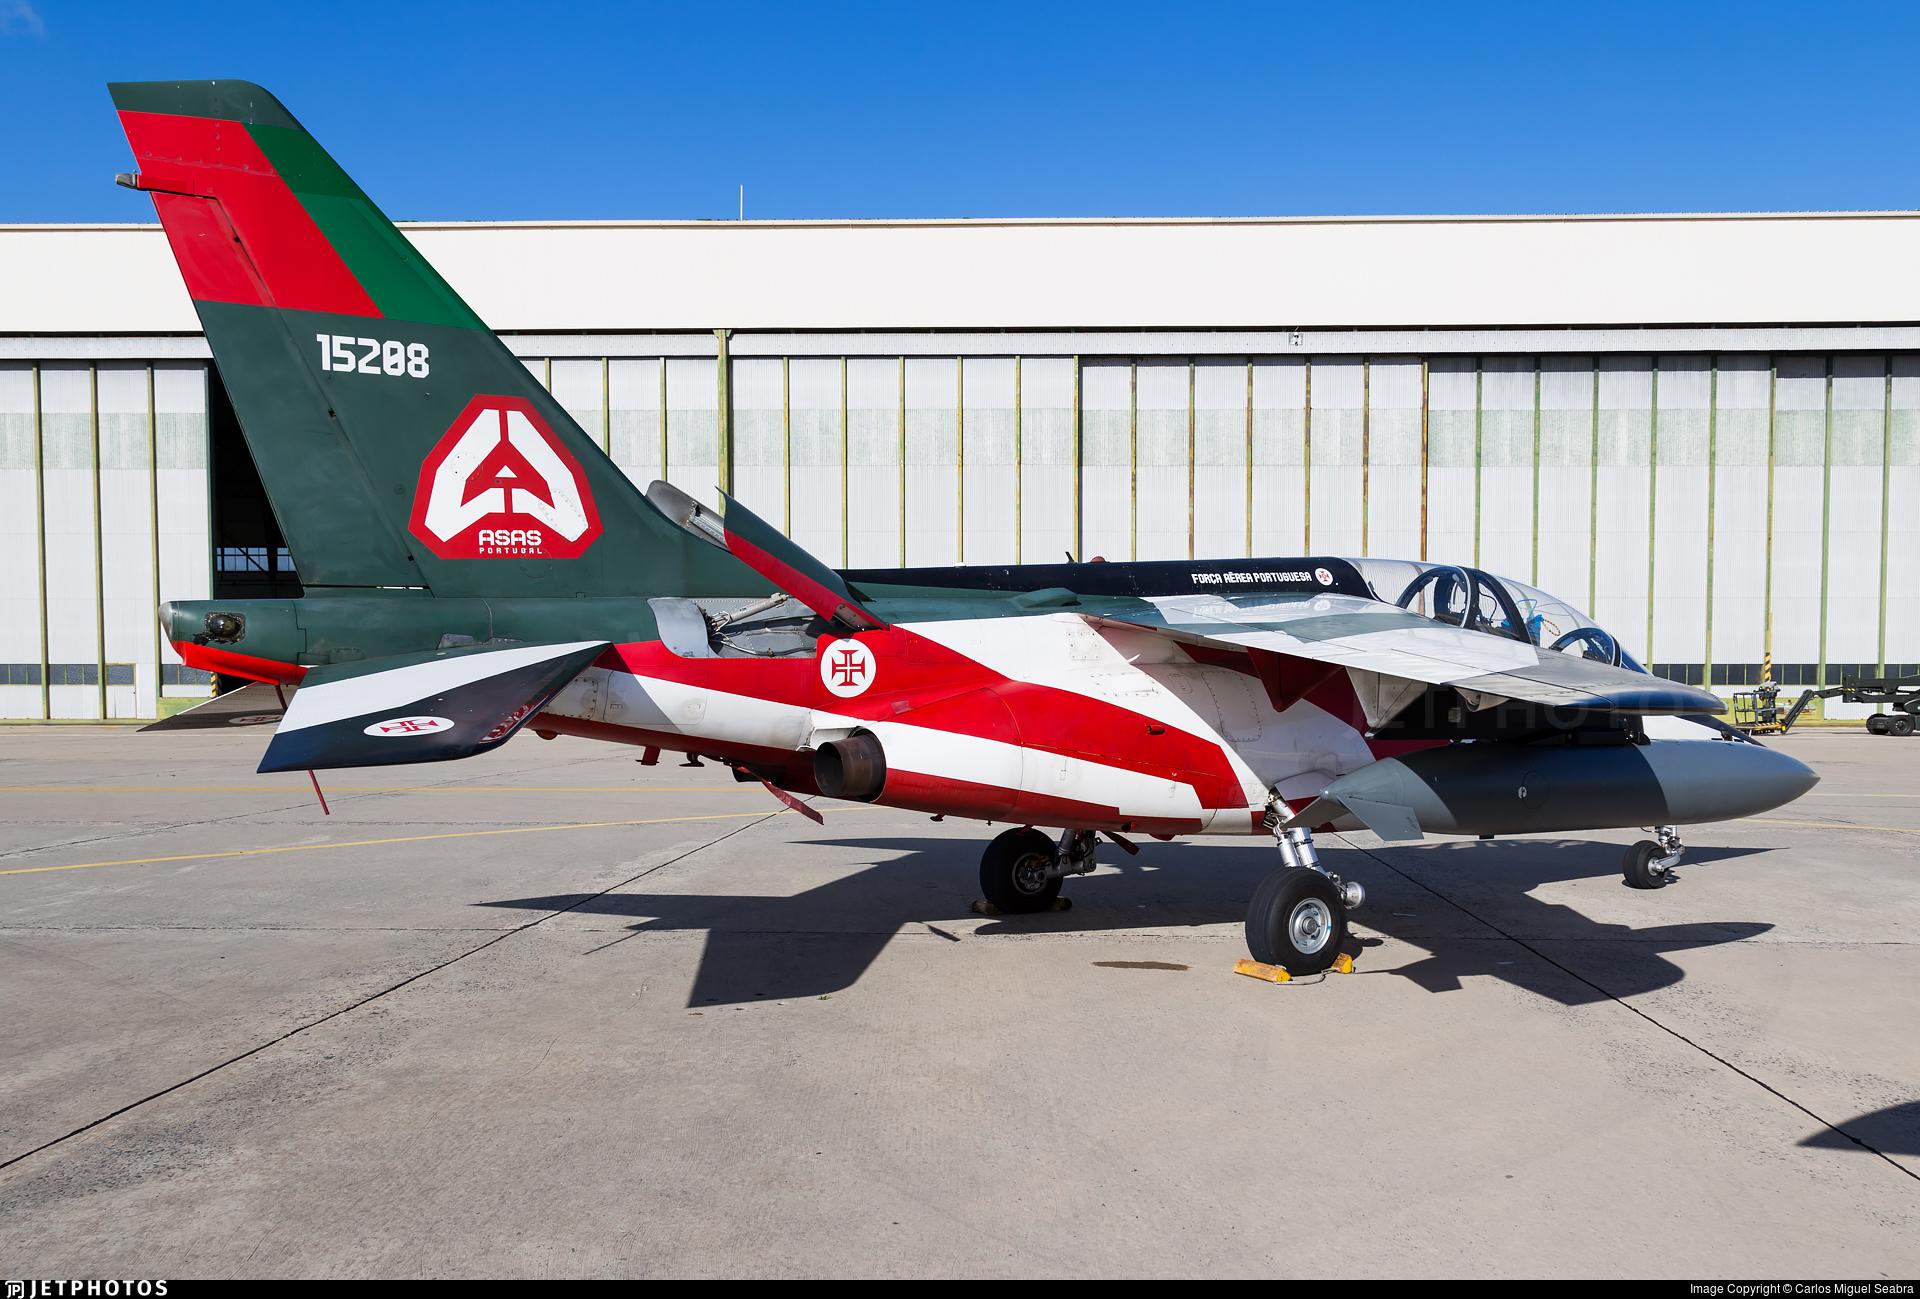 15208 - Dassault-Dornier Alpha Jet A - Portugal - Air Force